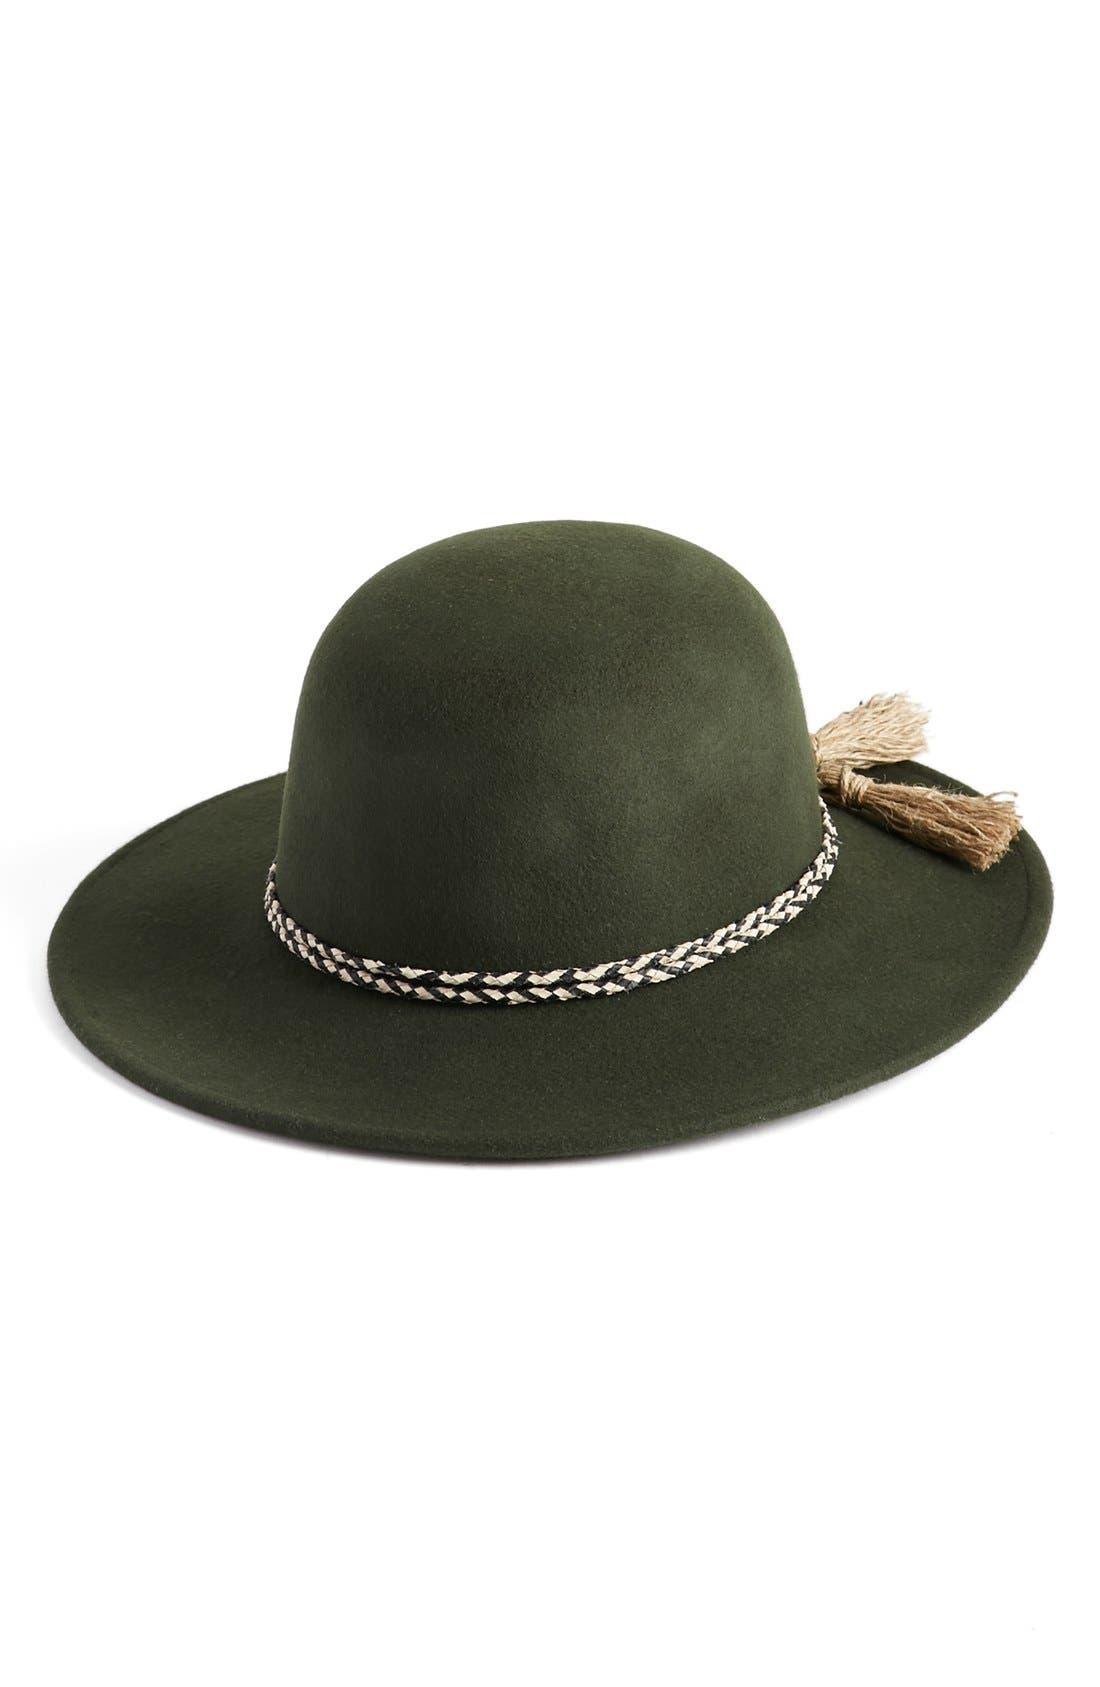 Alternate Image 1 Selected - Brixton 'Stills' Wool Hat